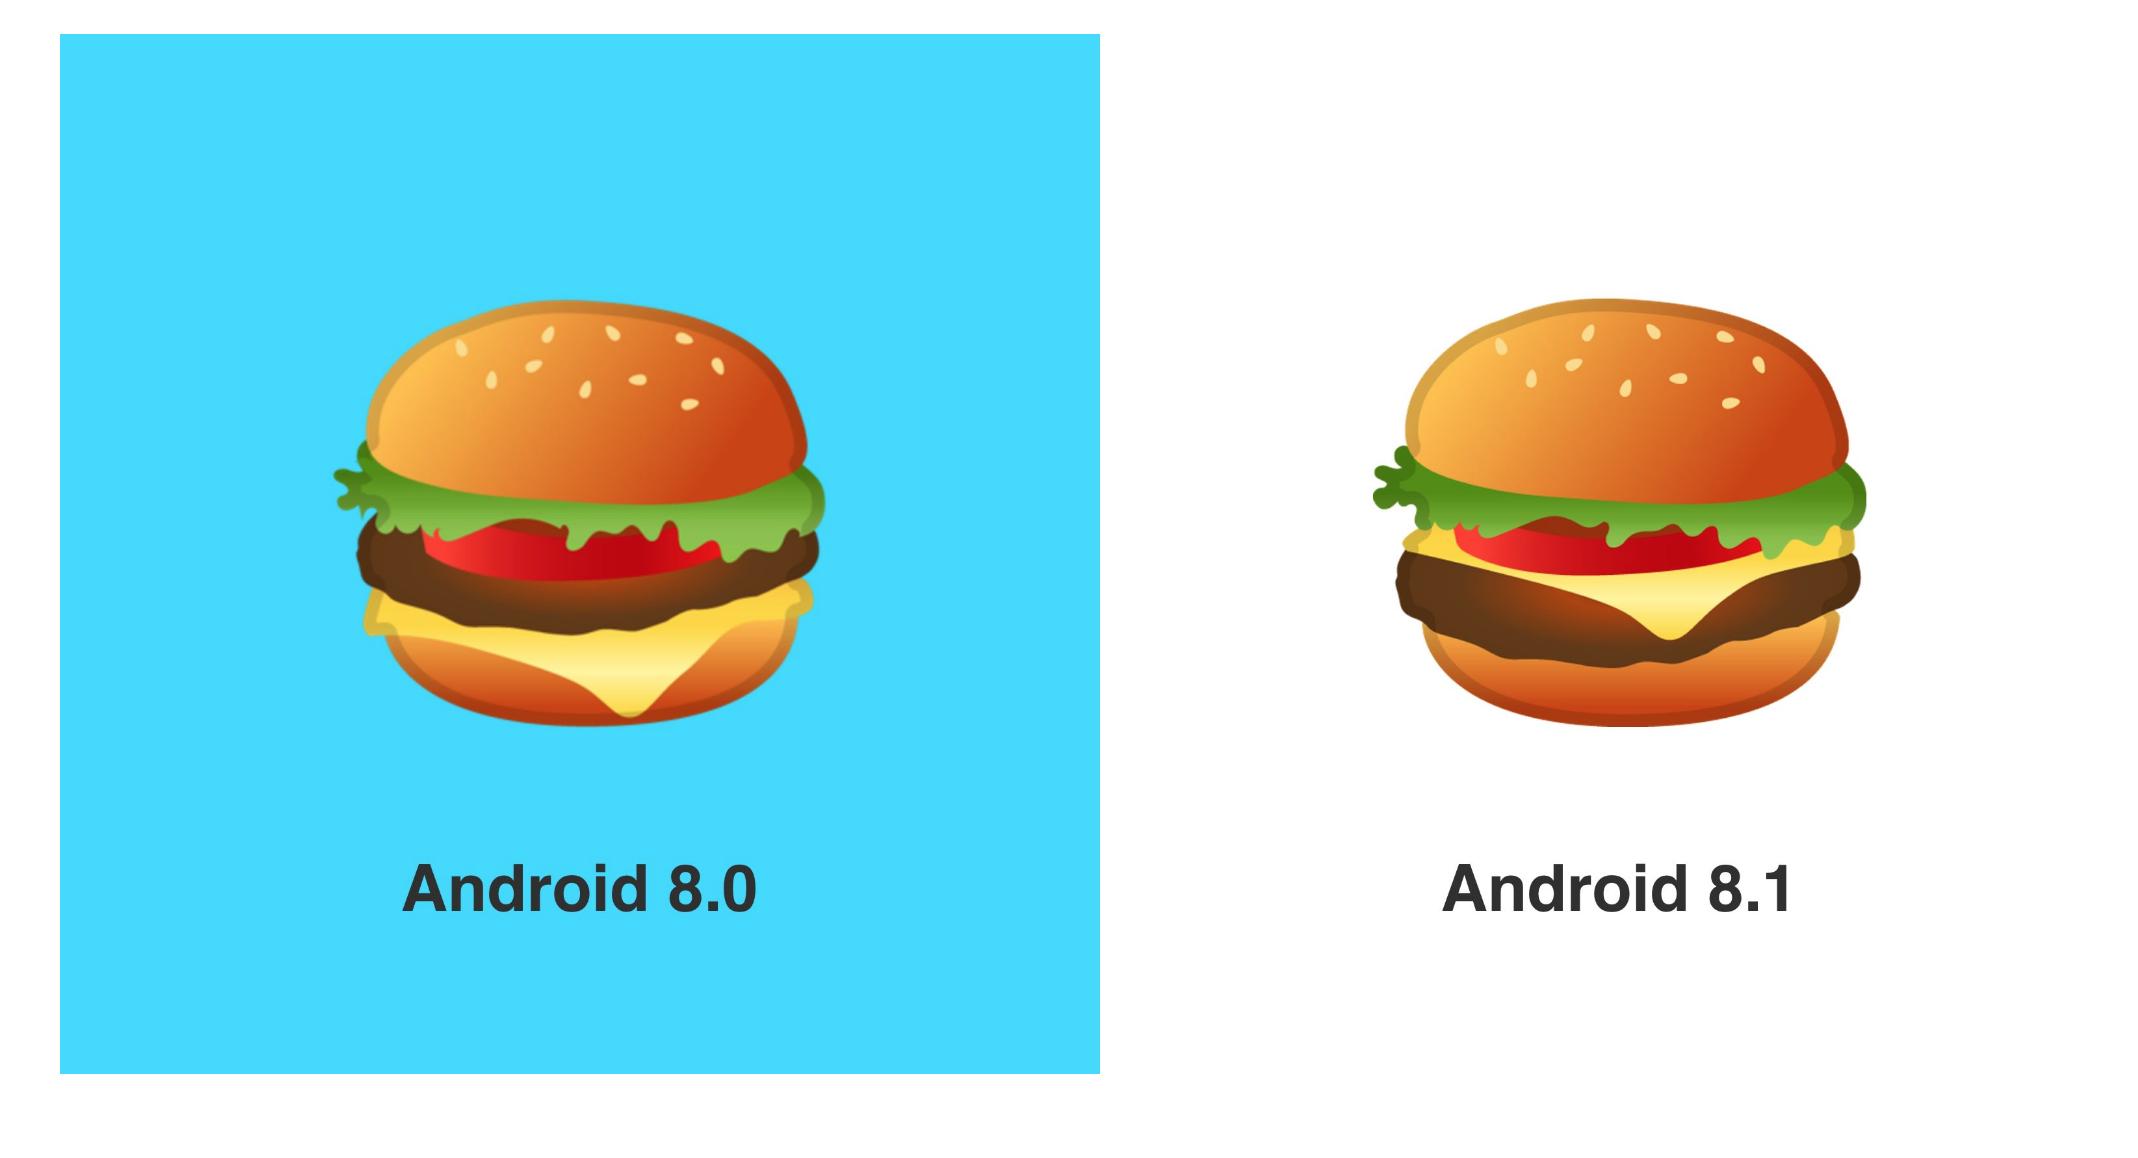 Android 8.1 burger emoji